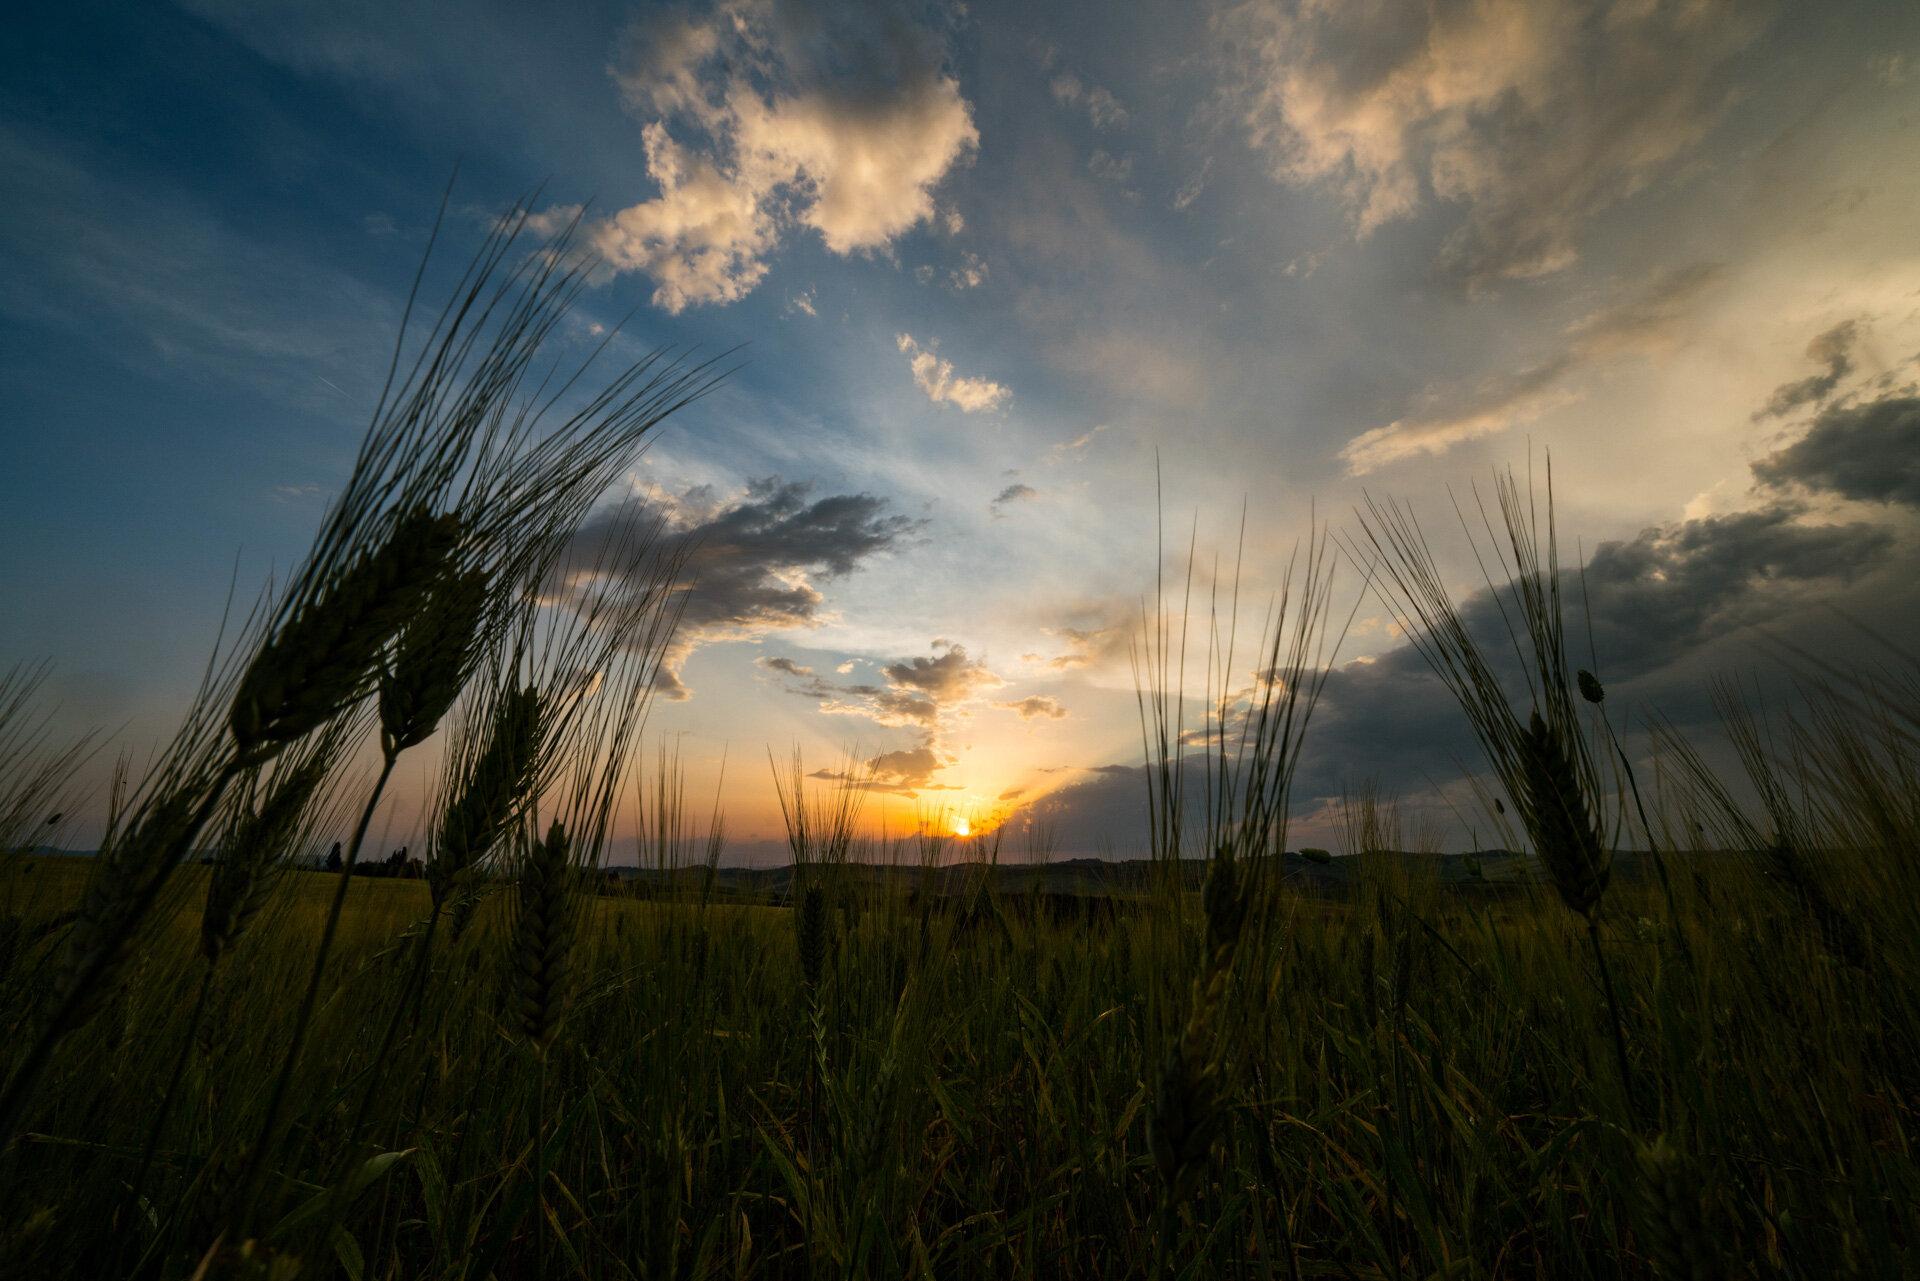 Sunset in Val d'Orcia  PHOTOGRAPHY: MIRKO FIN • Sony Alpha 7R MkIII • SONY FE 12-24MM Ƒ/4 G @ 12MM • Ƒ/13 • 1/125 sec • ISO 200